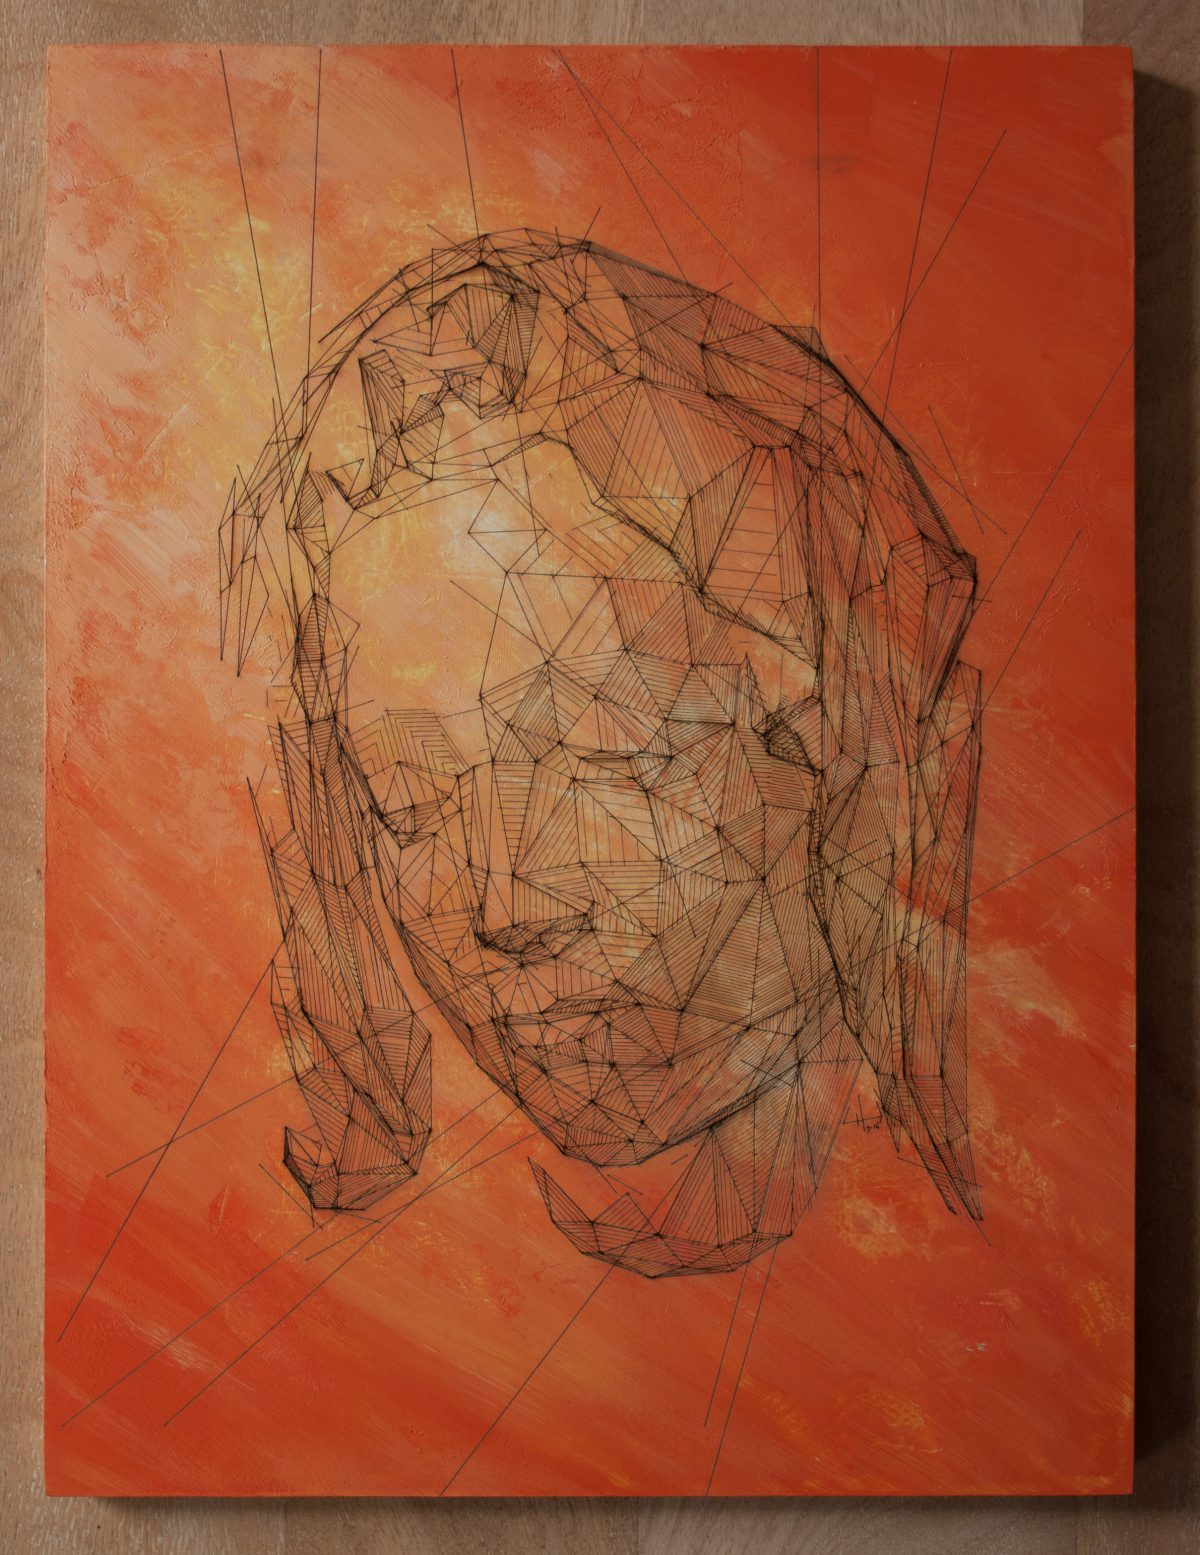 Pieta - 30x40cm laser cut, wooden panel, acrylics, laser, digital, acrylic, wood, ch3